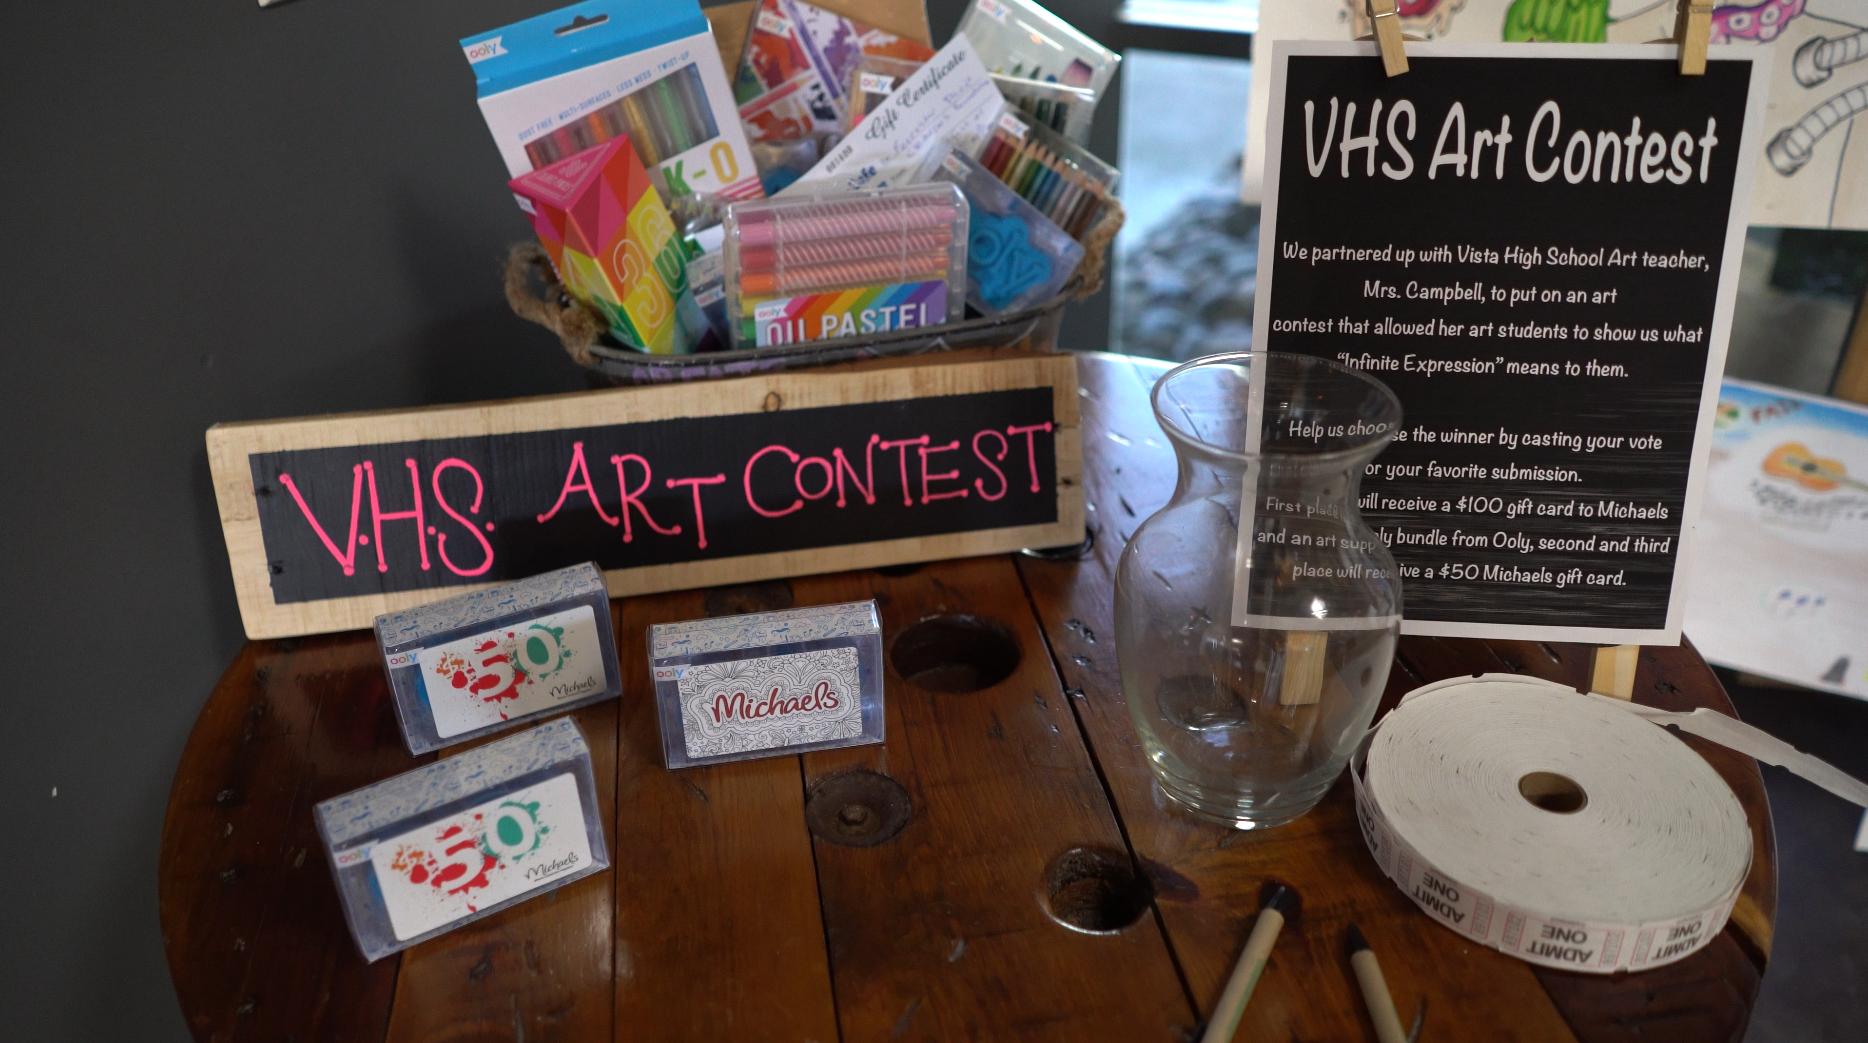 VHS Art Contest